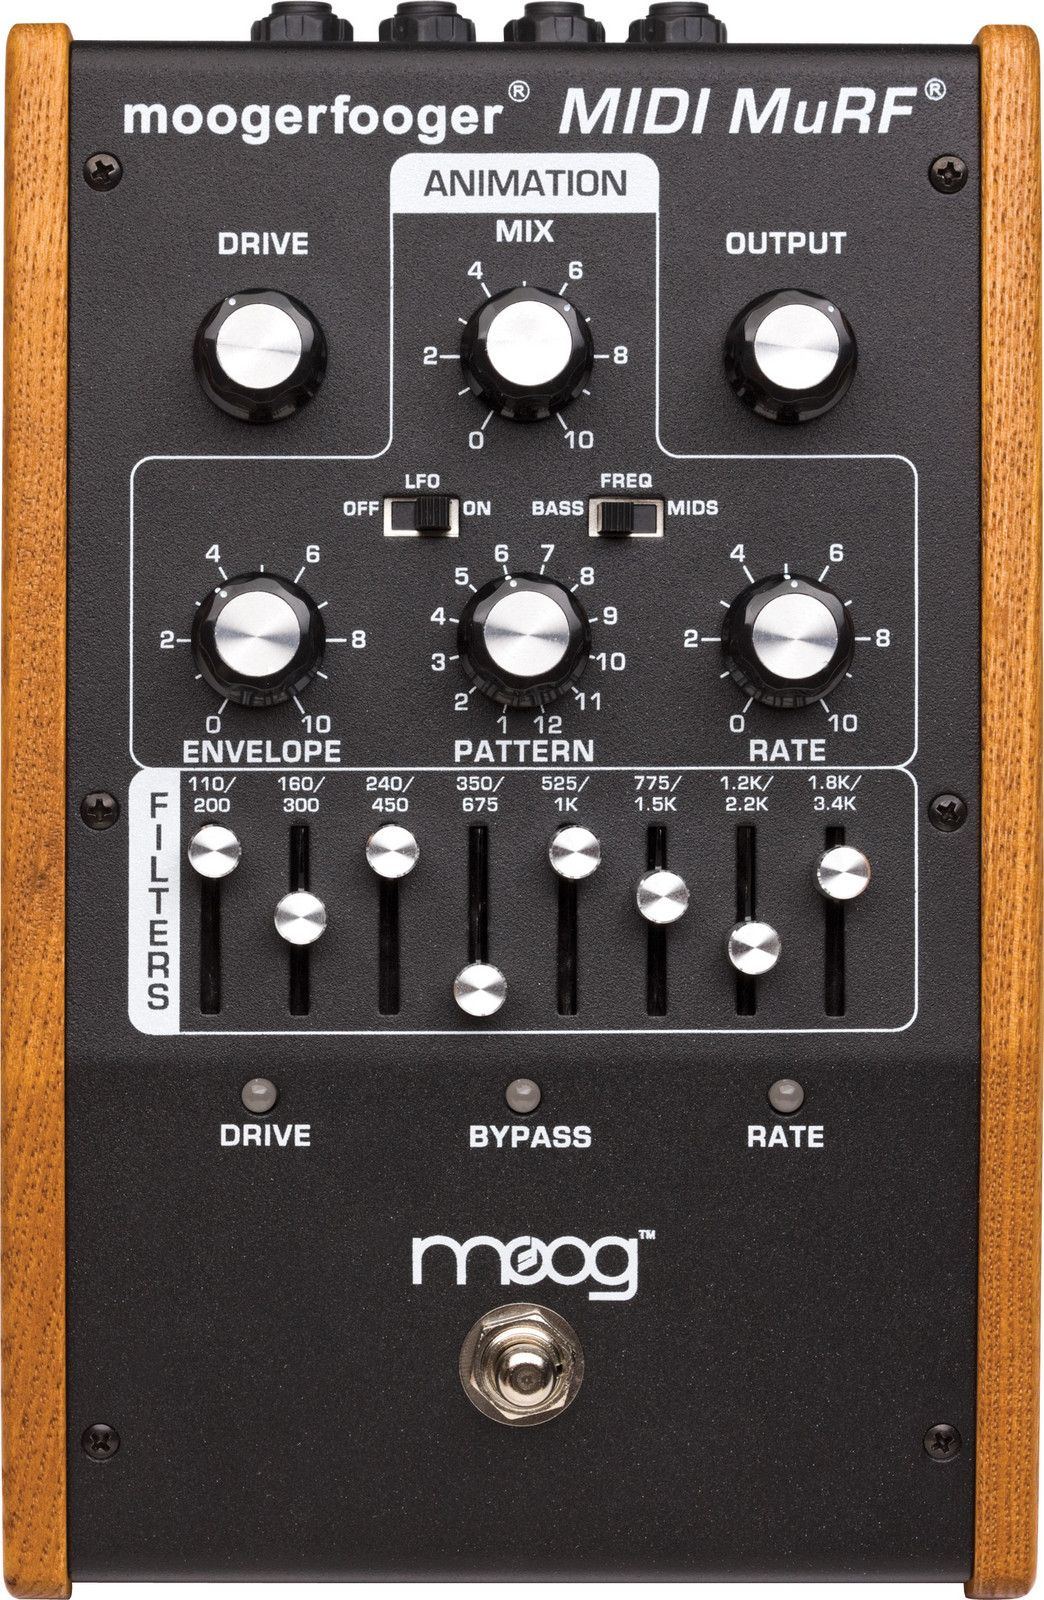 moogerfooger great guitar pedal names in 2019 guitar pedals drum machine instruments. Black Bedroom Furniture Sets. Home Design Ideas